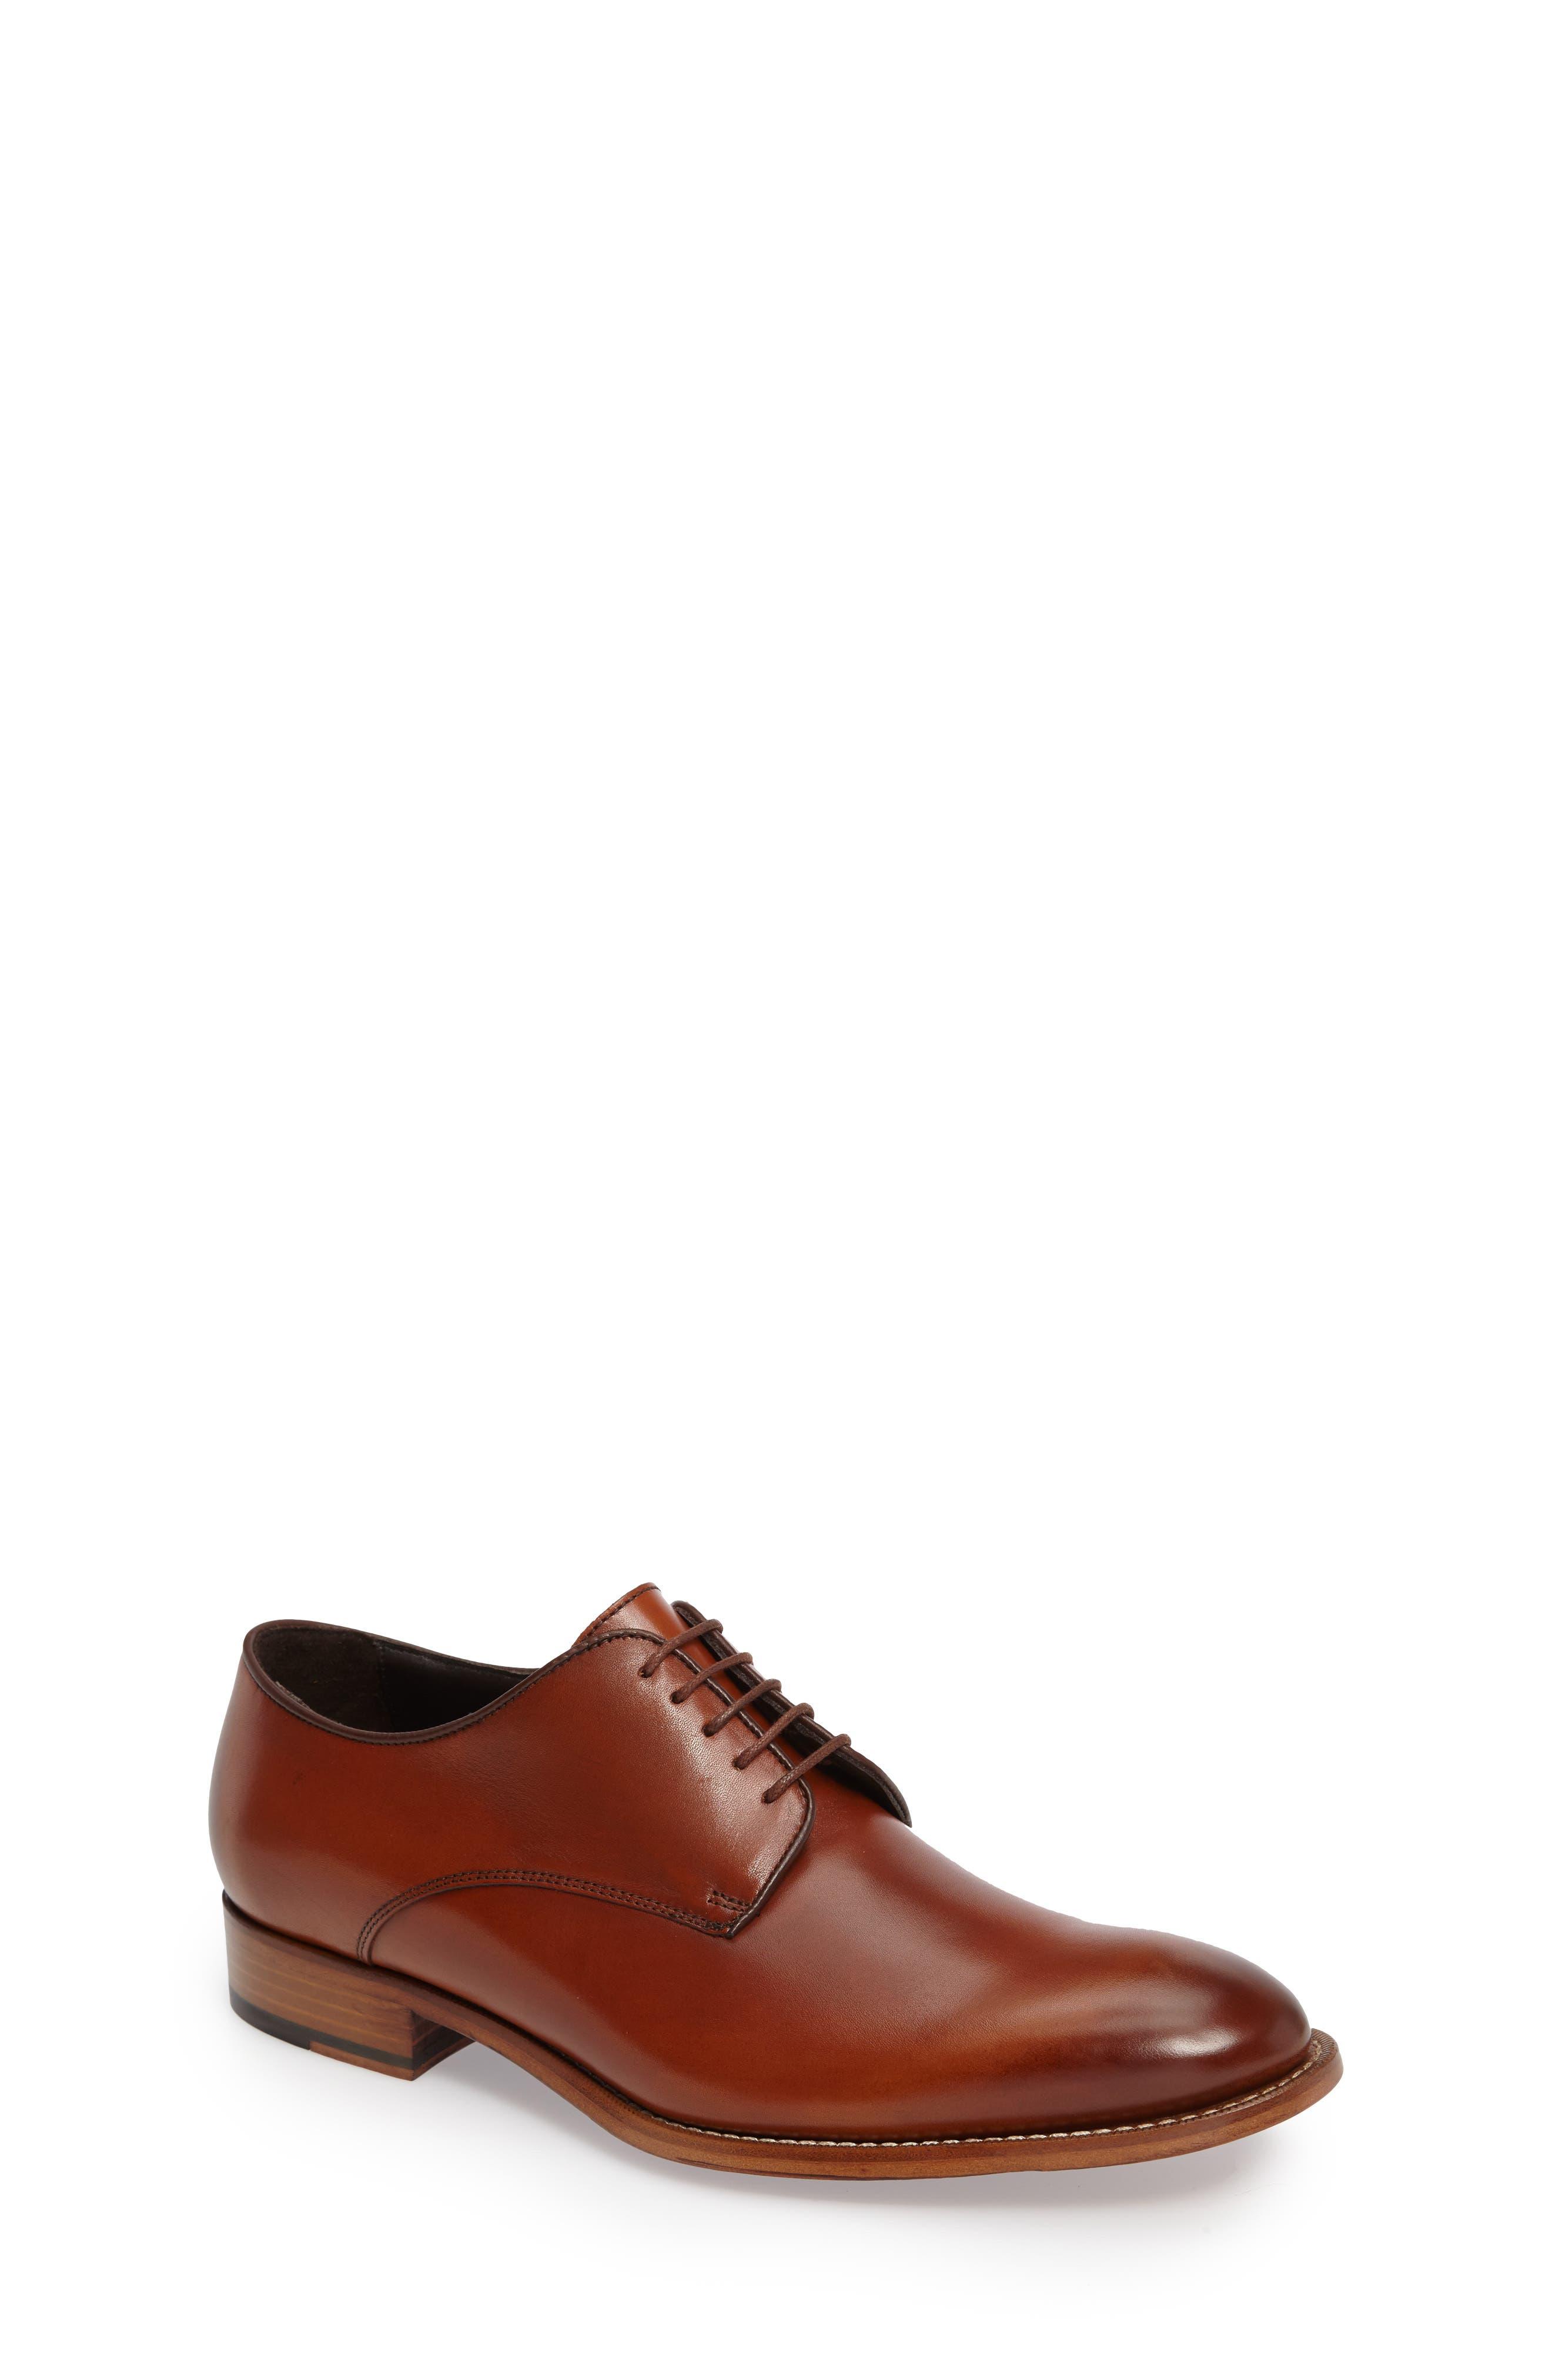 Alternate Image 1 Selected - To Boot New York Hank Plain Toe Derby (Men)